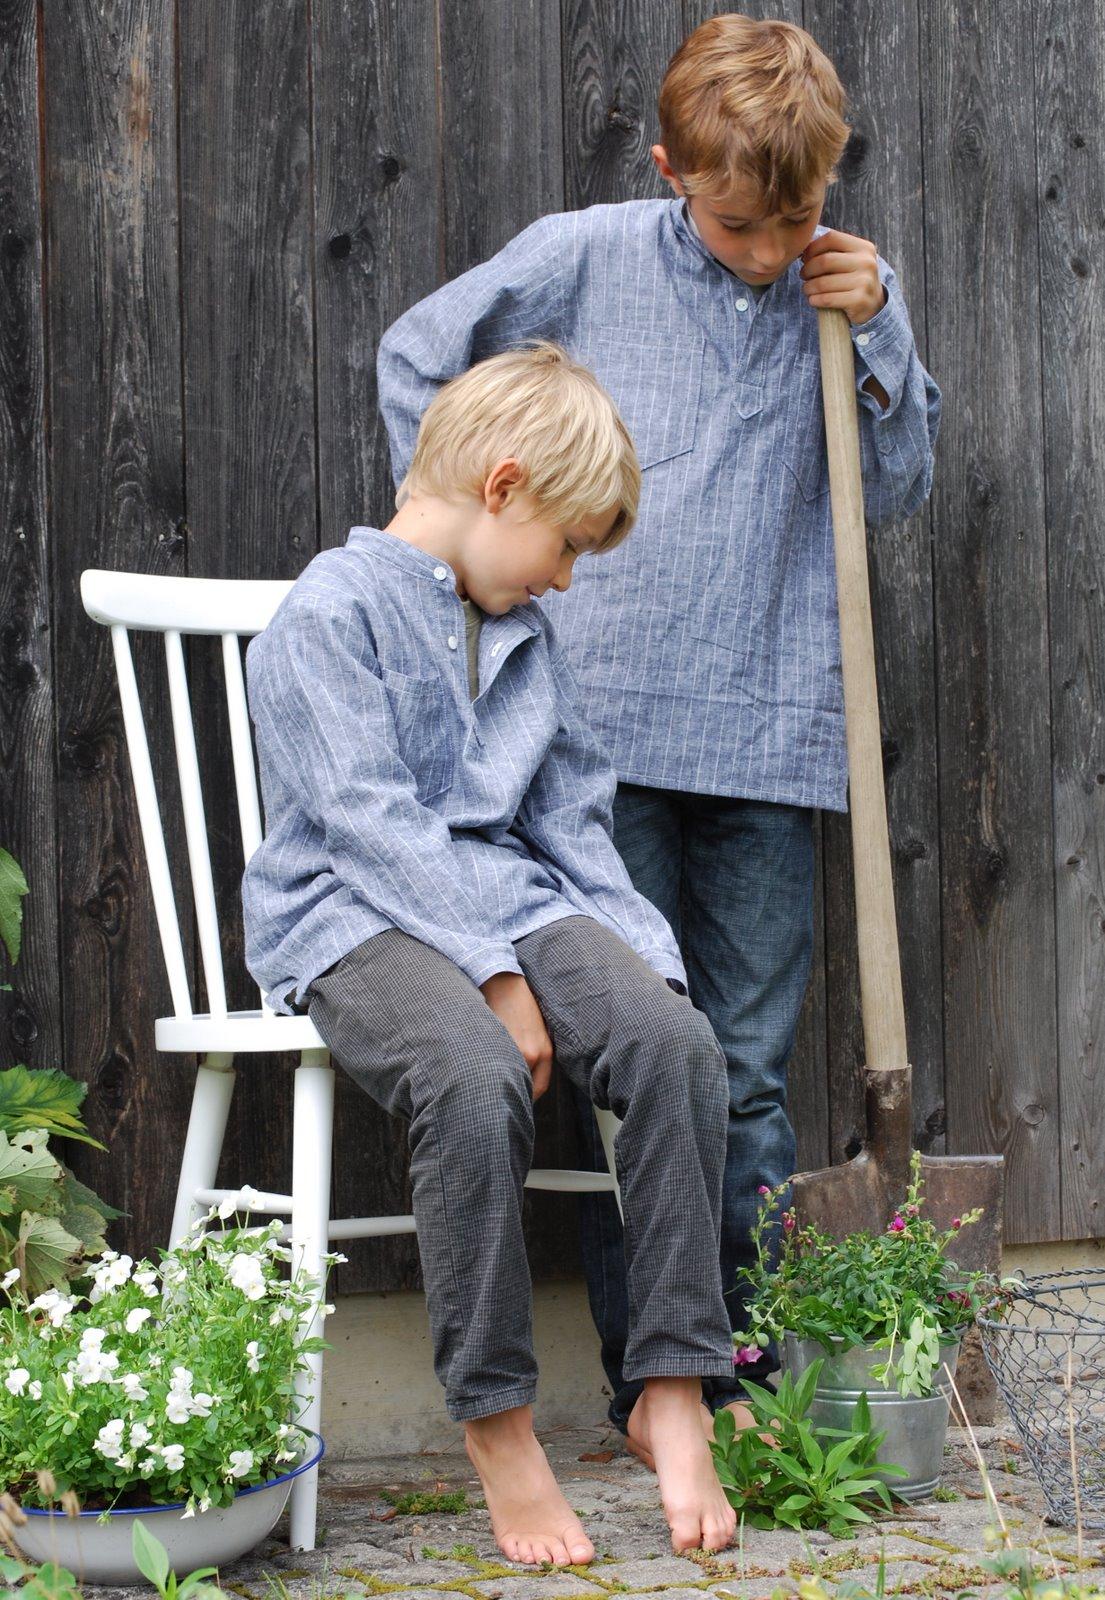 mamas kram: Gartenarbeit in neuen Hemden